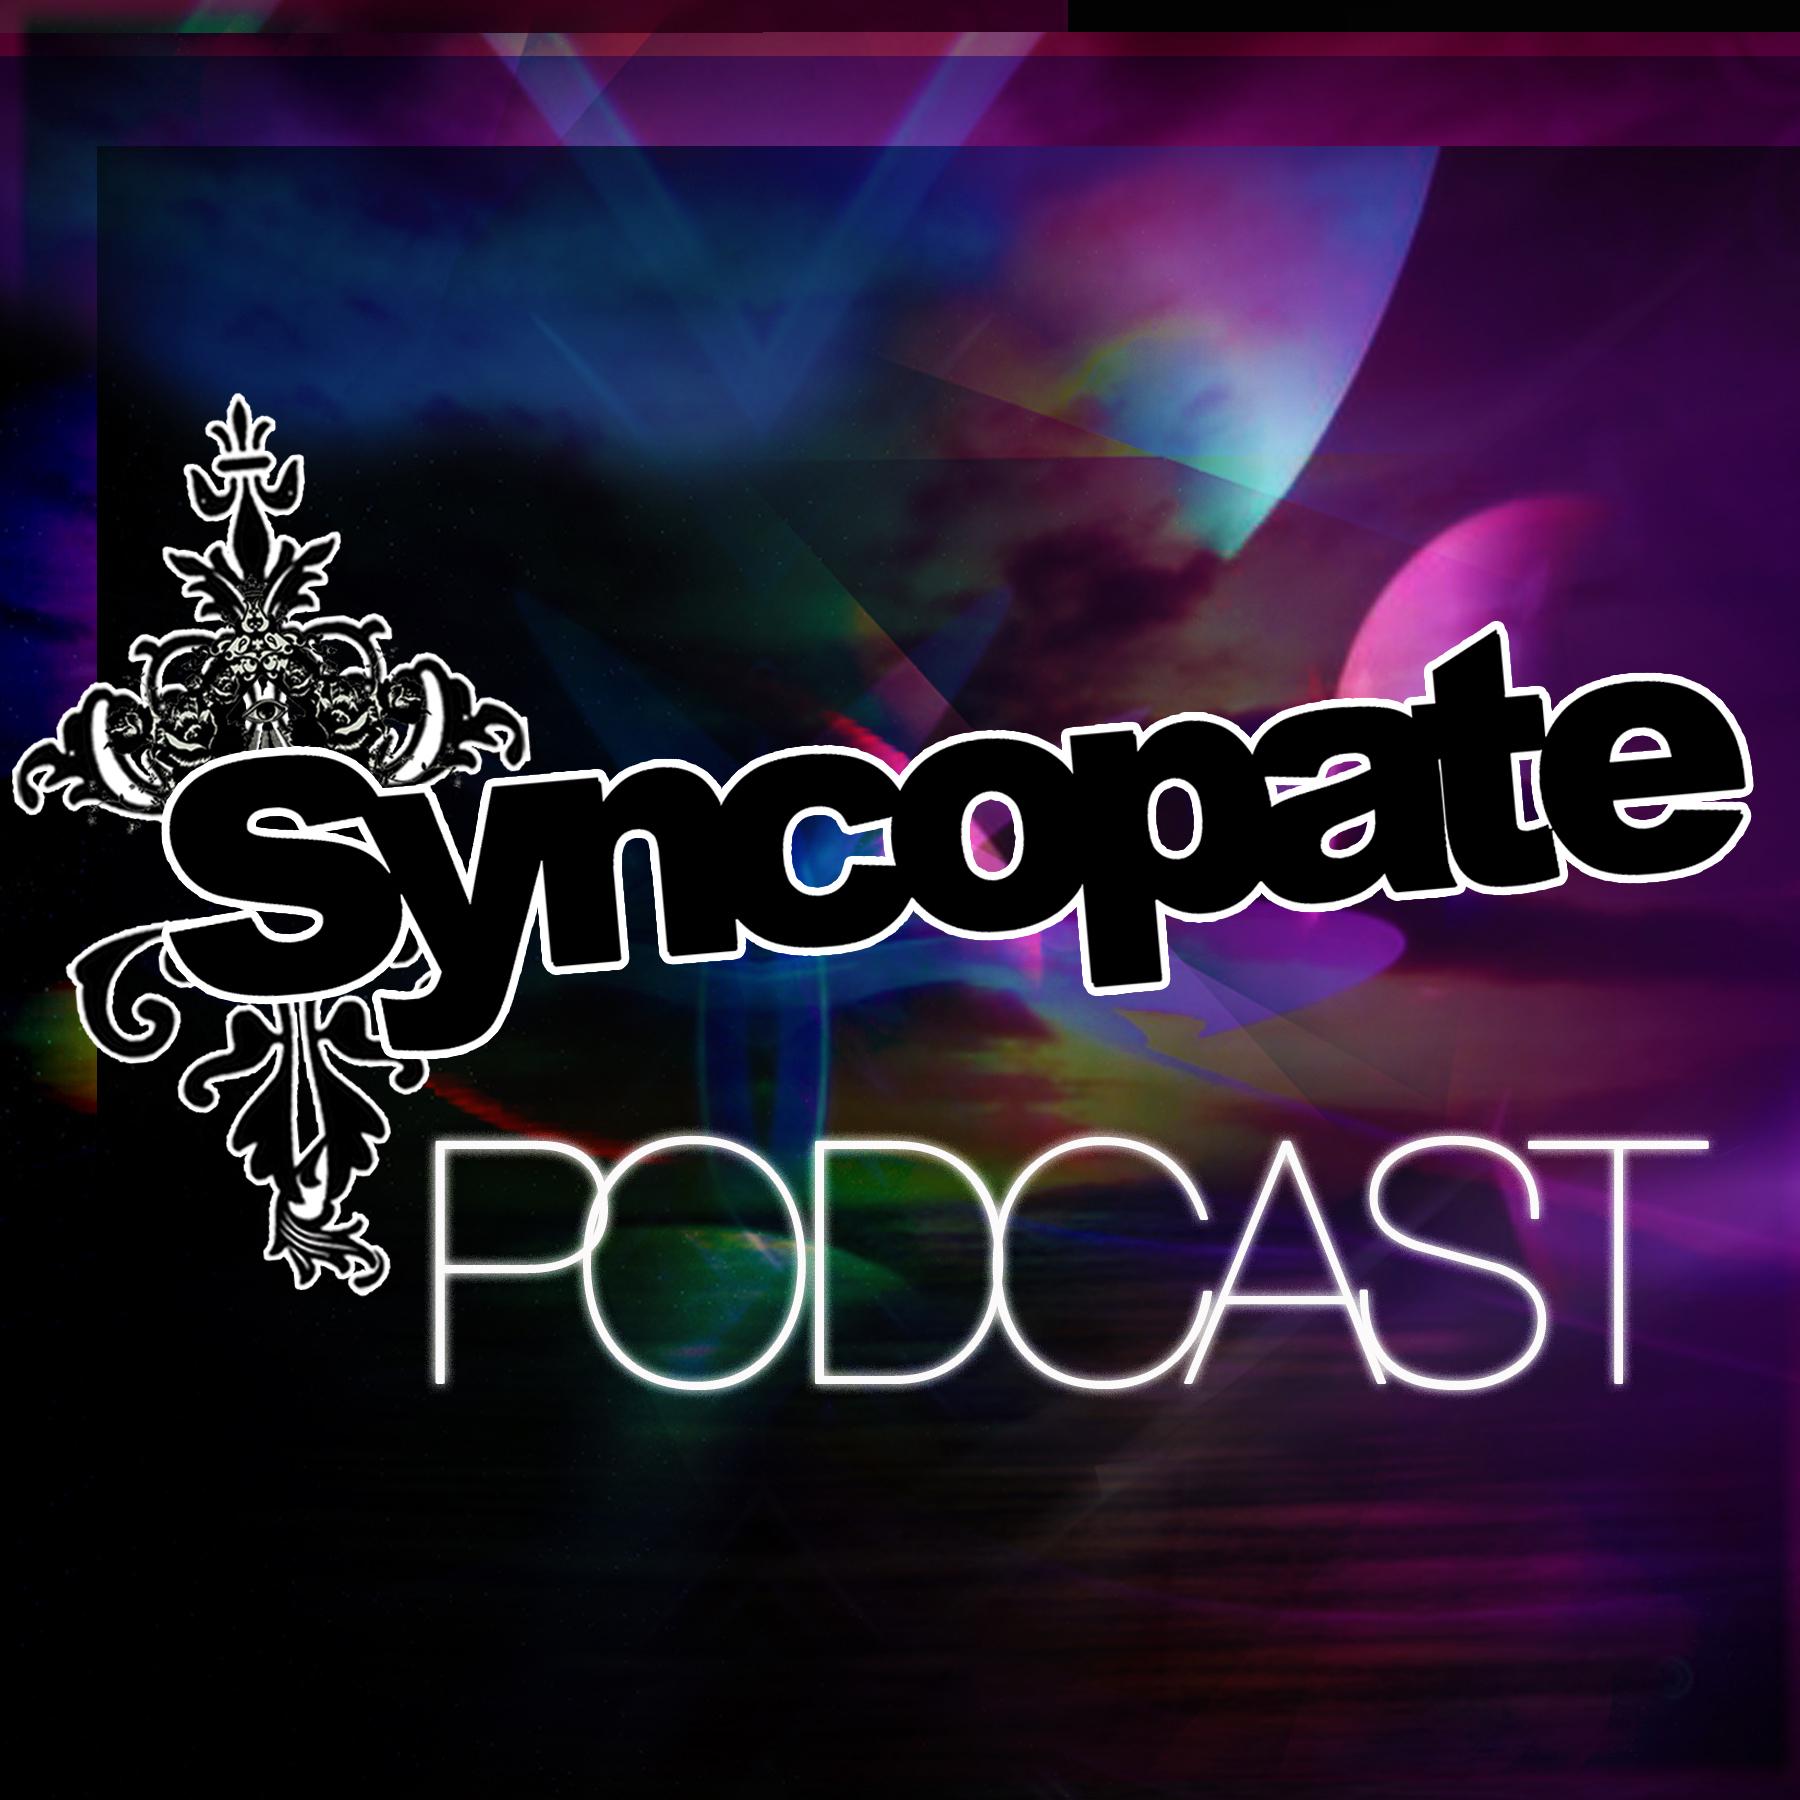 Babayaga DJ Syncopate Podcast